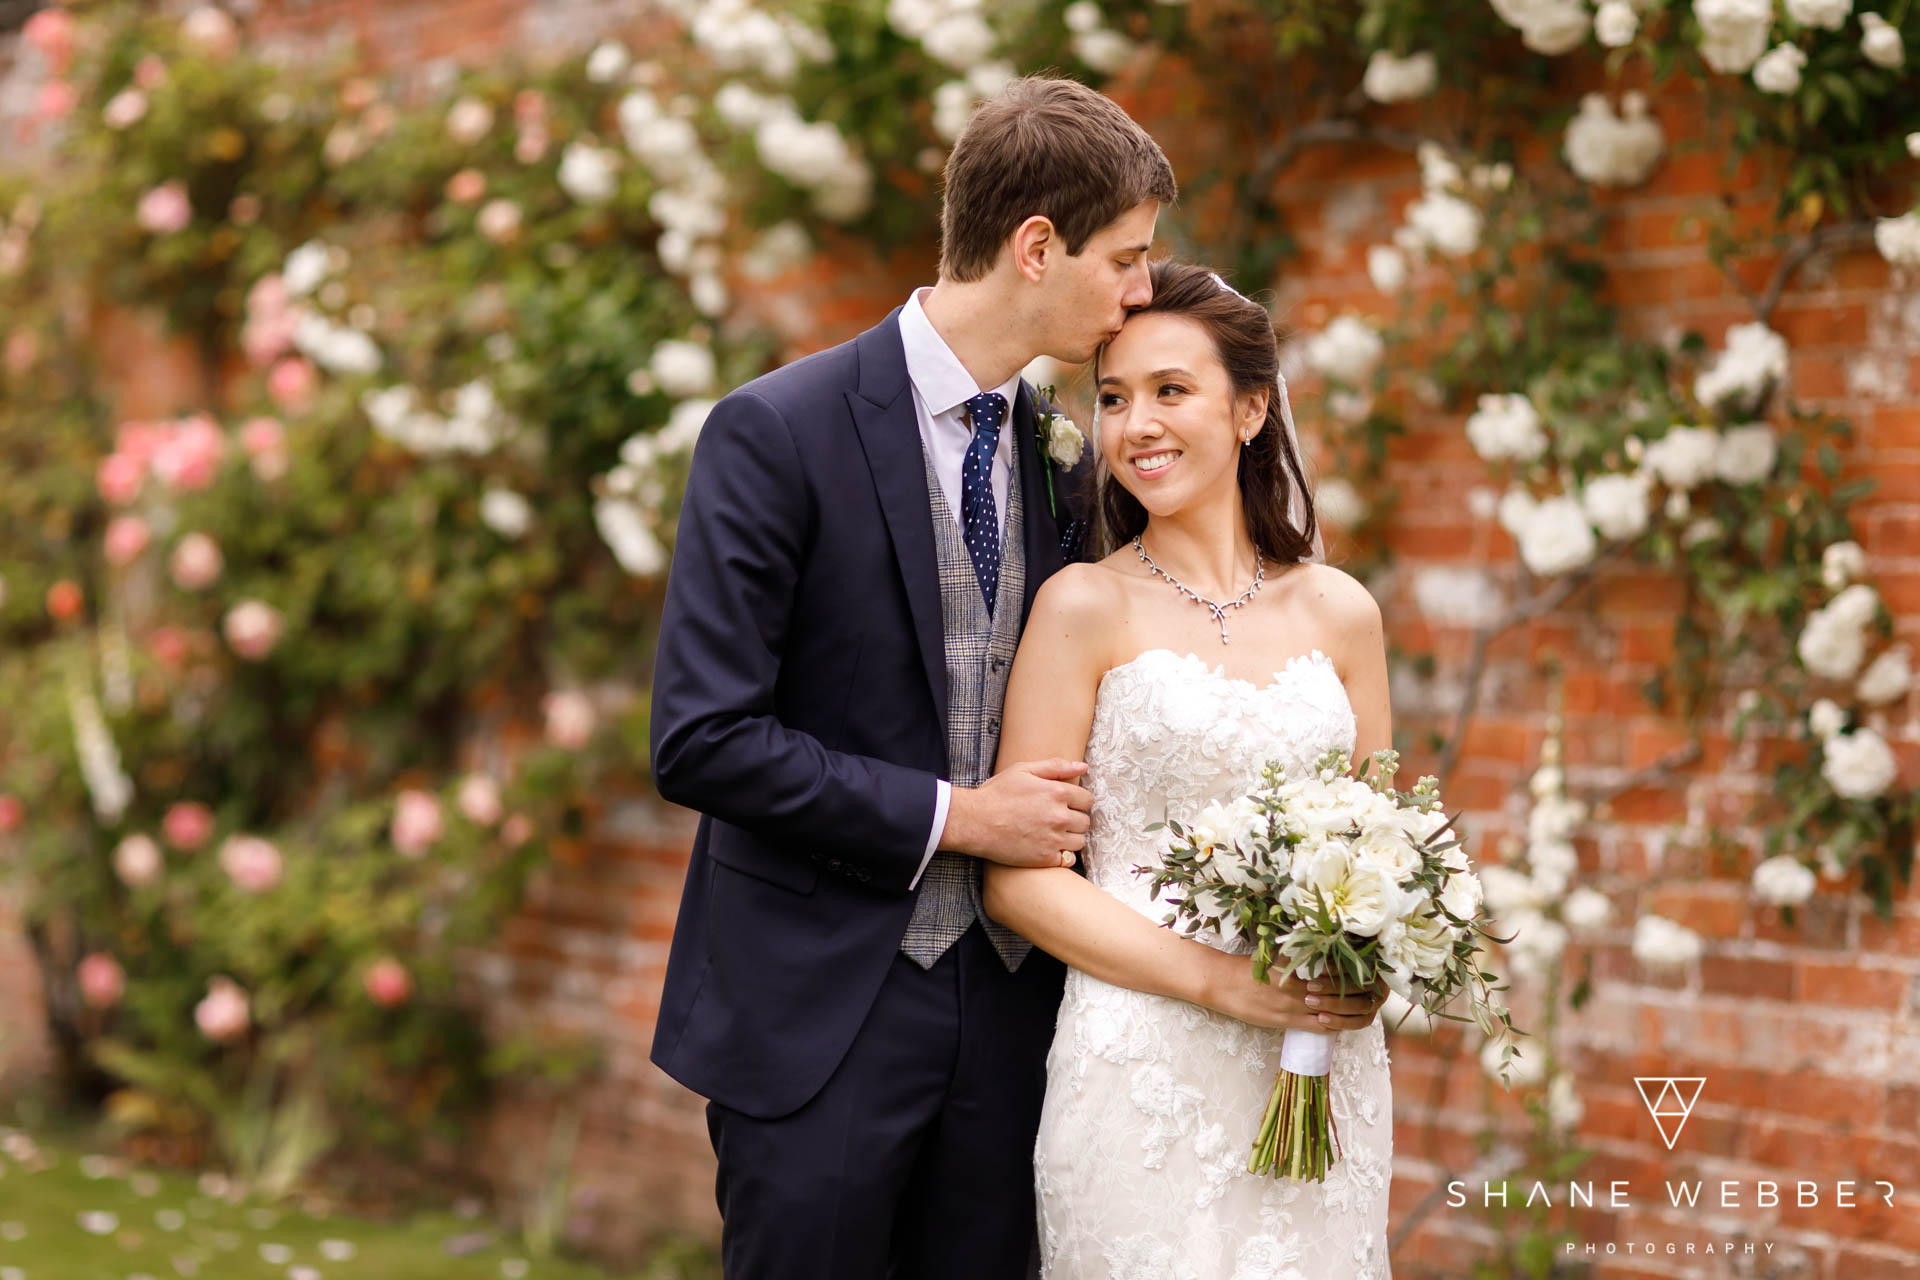 Wedding planning practical tips